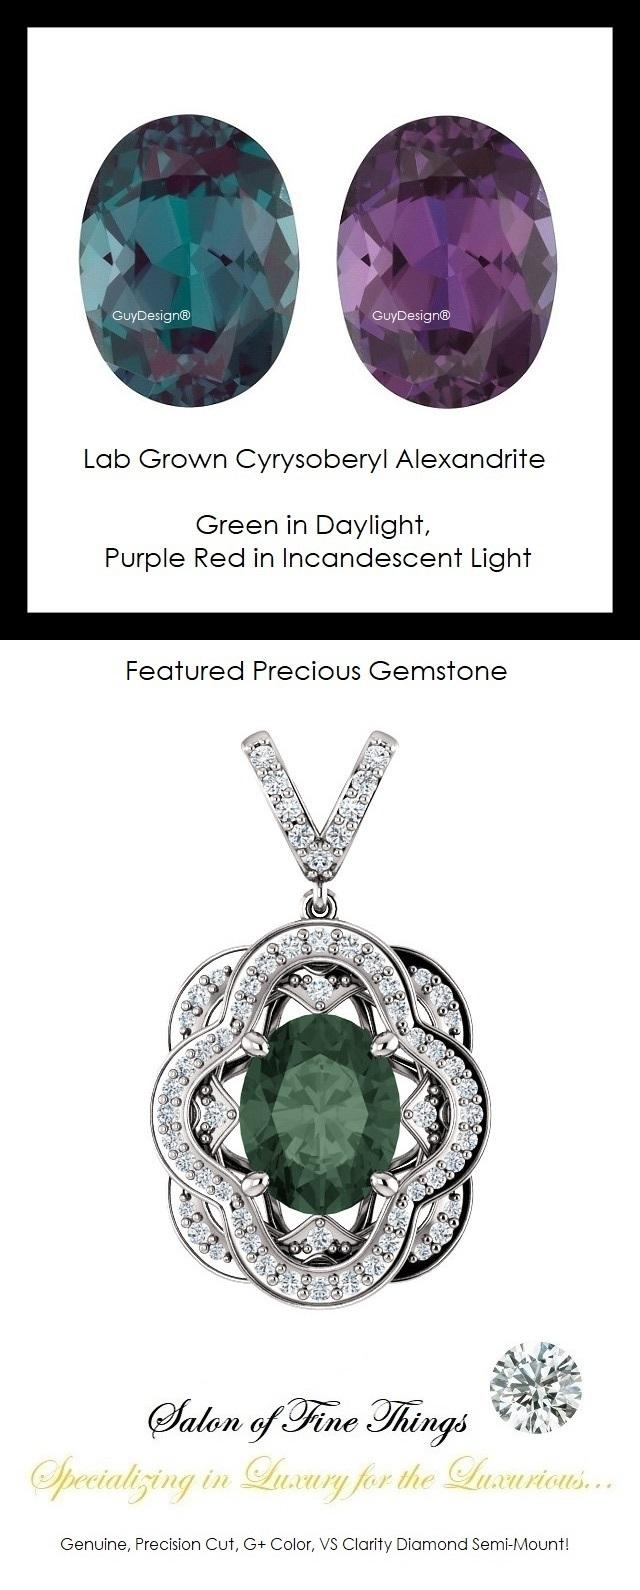 guydesign-opulent-14-karat-white-gold-pendant-necklace-dg121689.91020000.86121.9-3.35-carat.-lab-grown-chrysoberyl-alexandrite-set-with-precision-cut-g-vs-genuine-mined-diamonds-1.jpg